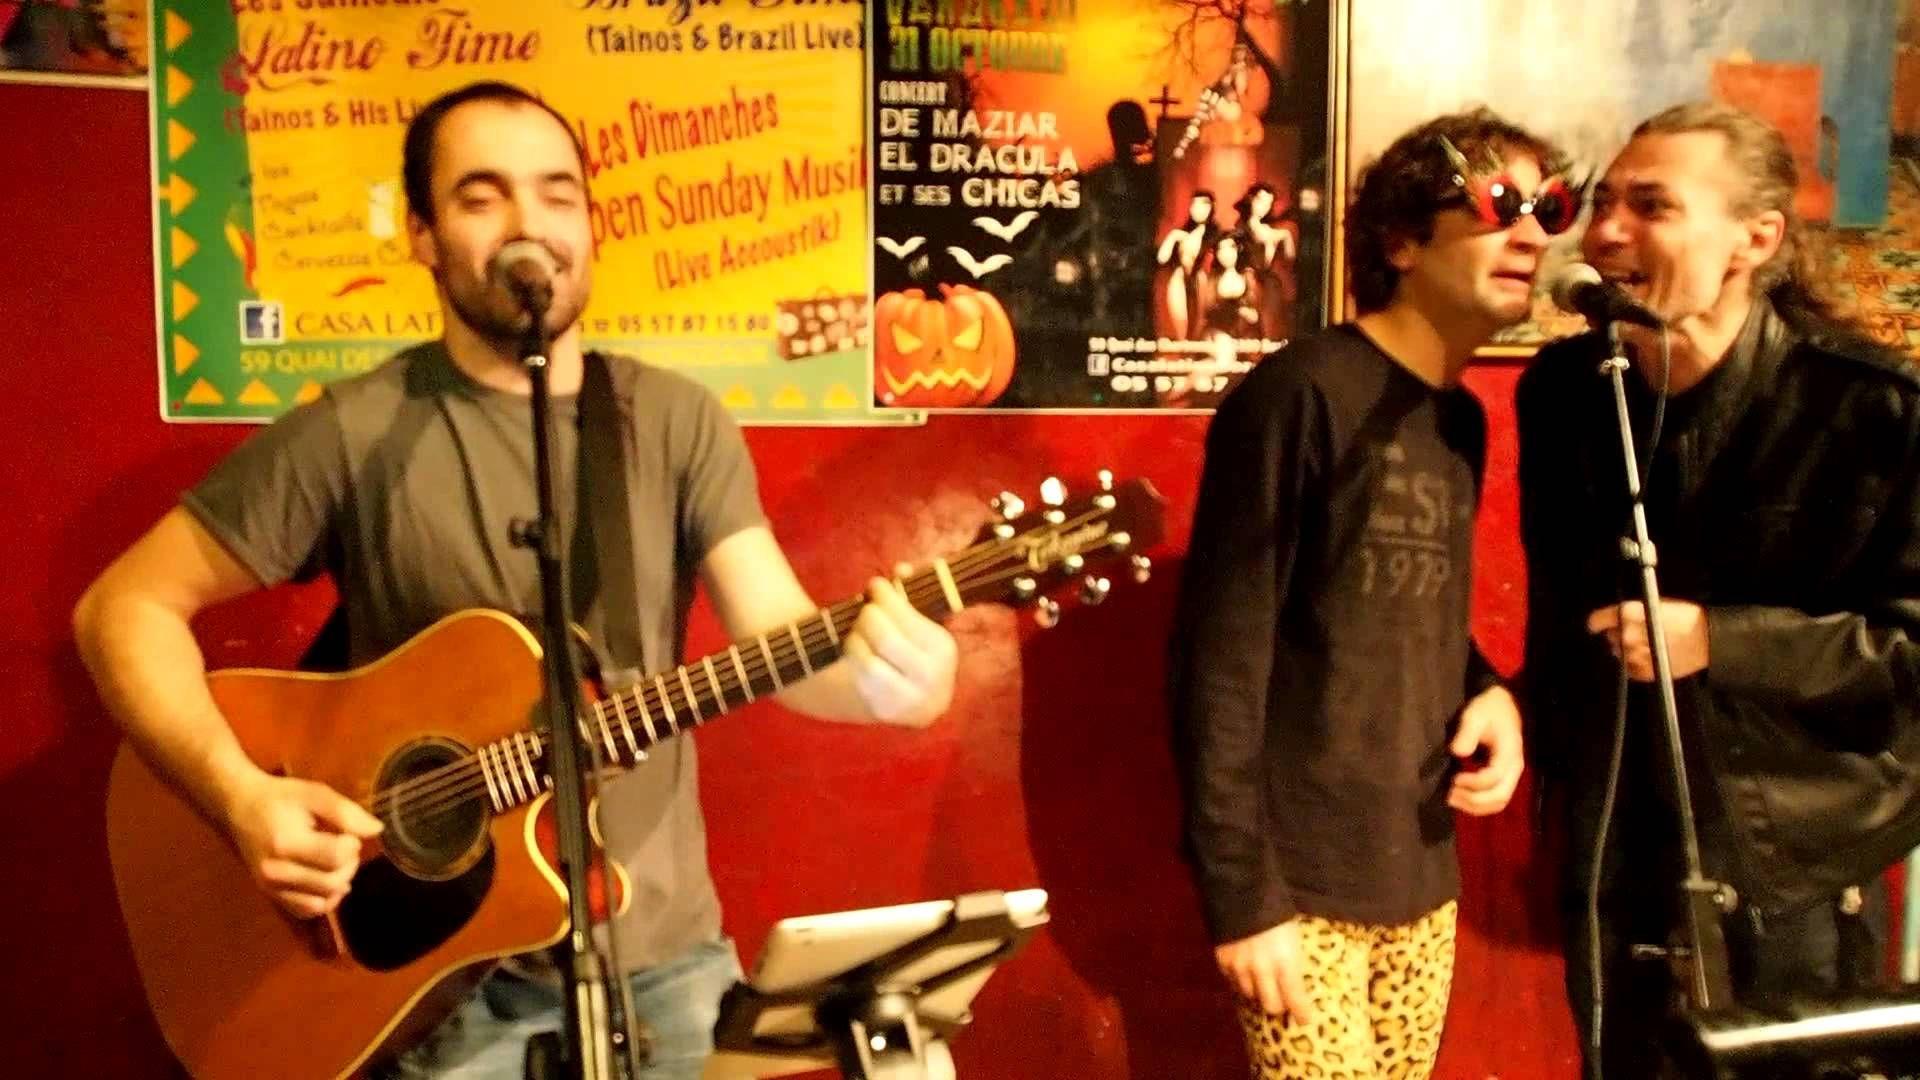 English man in New York Open Sunday Music Casa Latina le